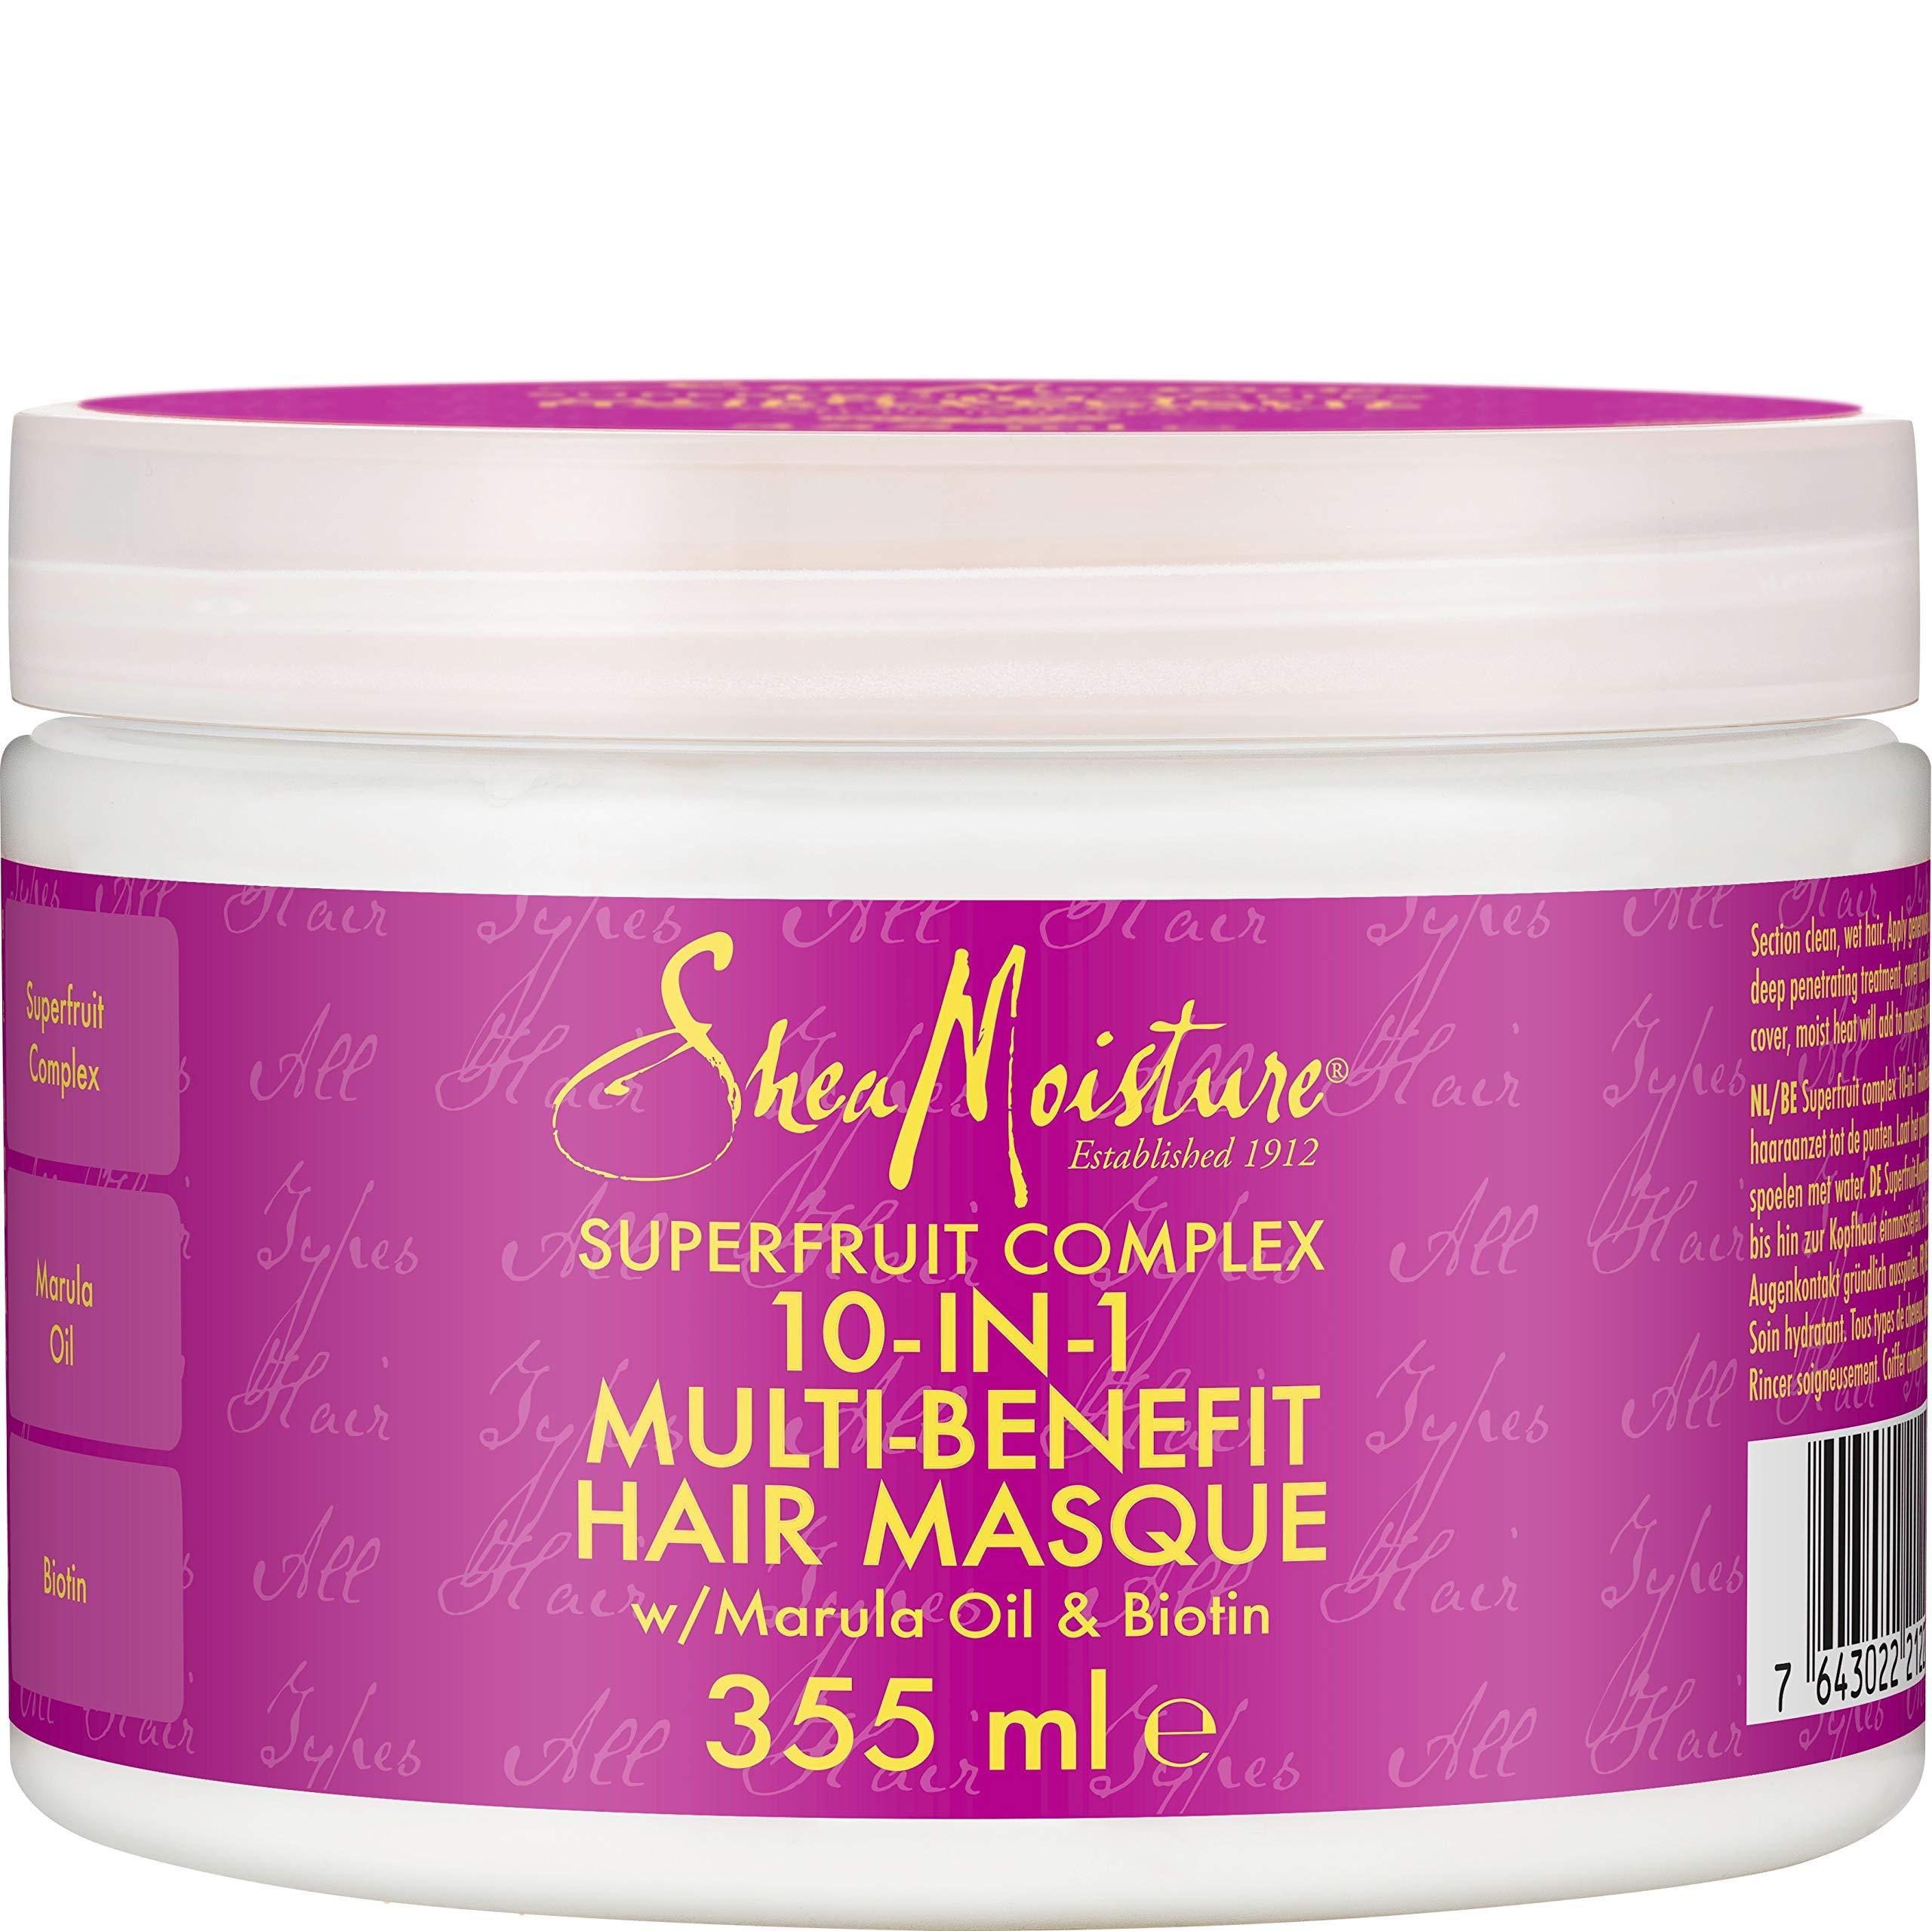 Shea Moisture Superfruit 10-in-1 Renewal System Hair Masque, 355 ml